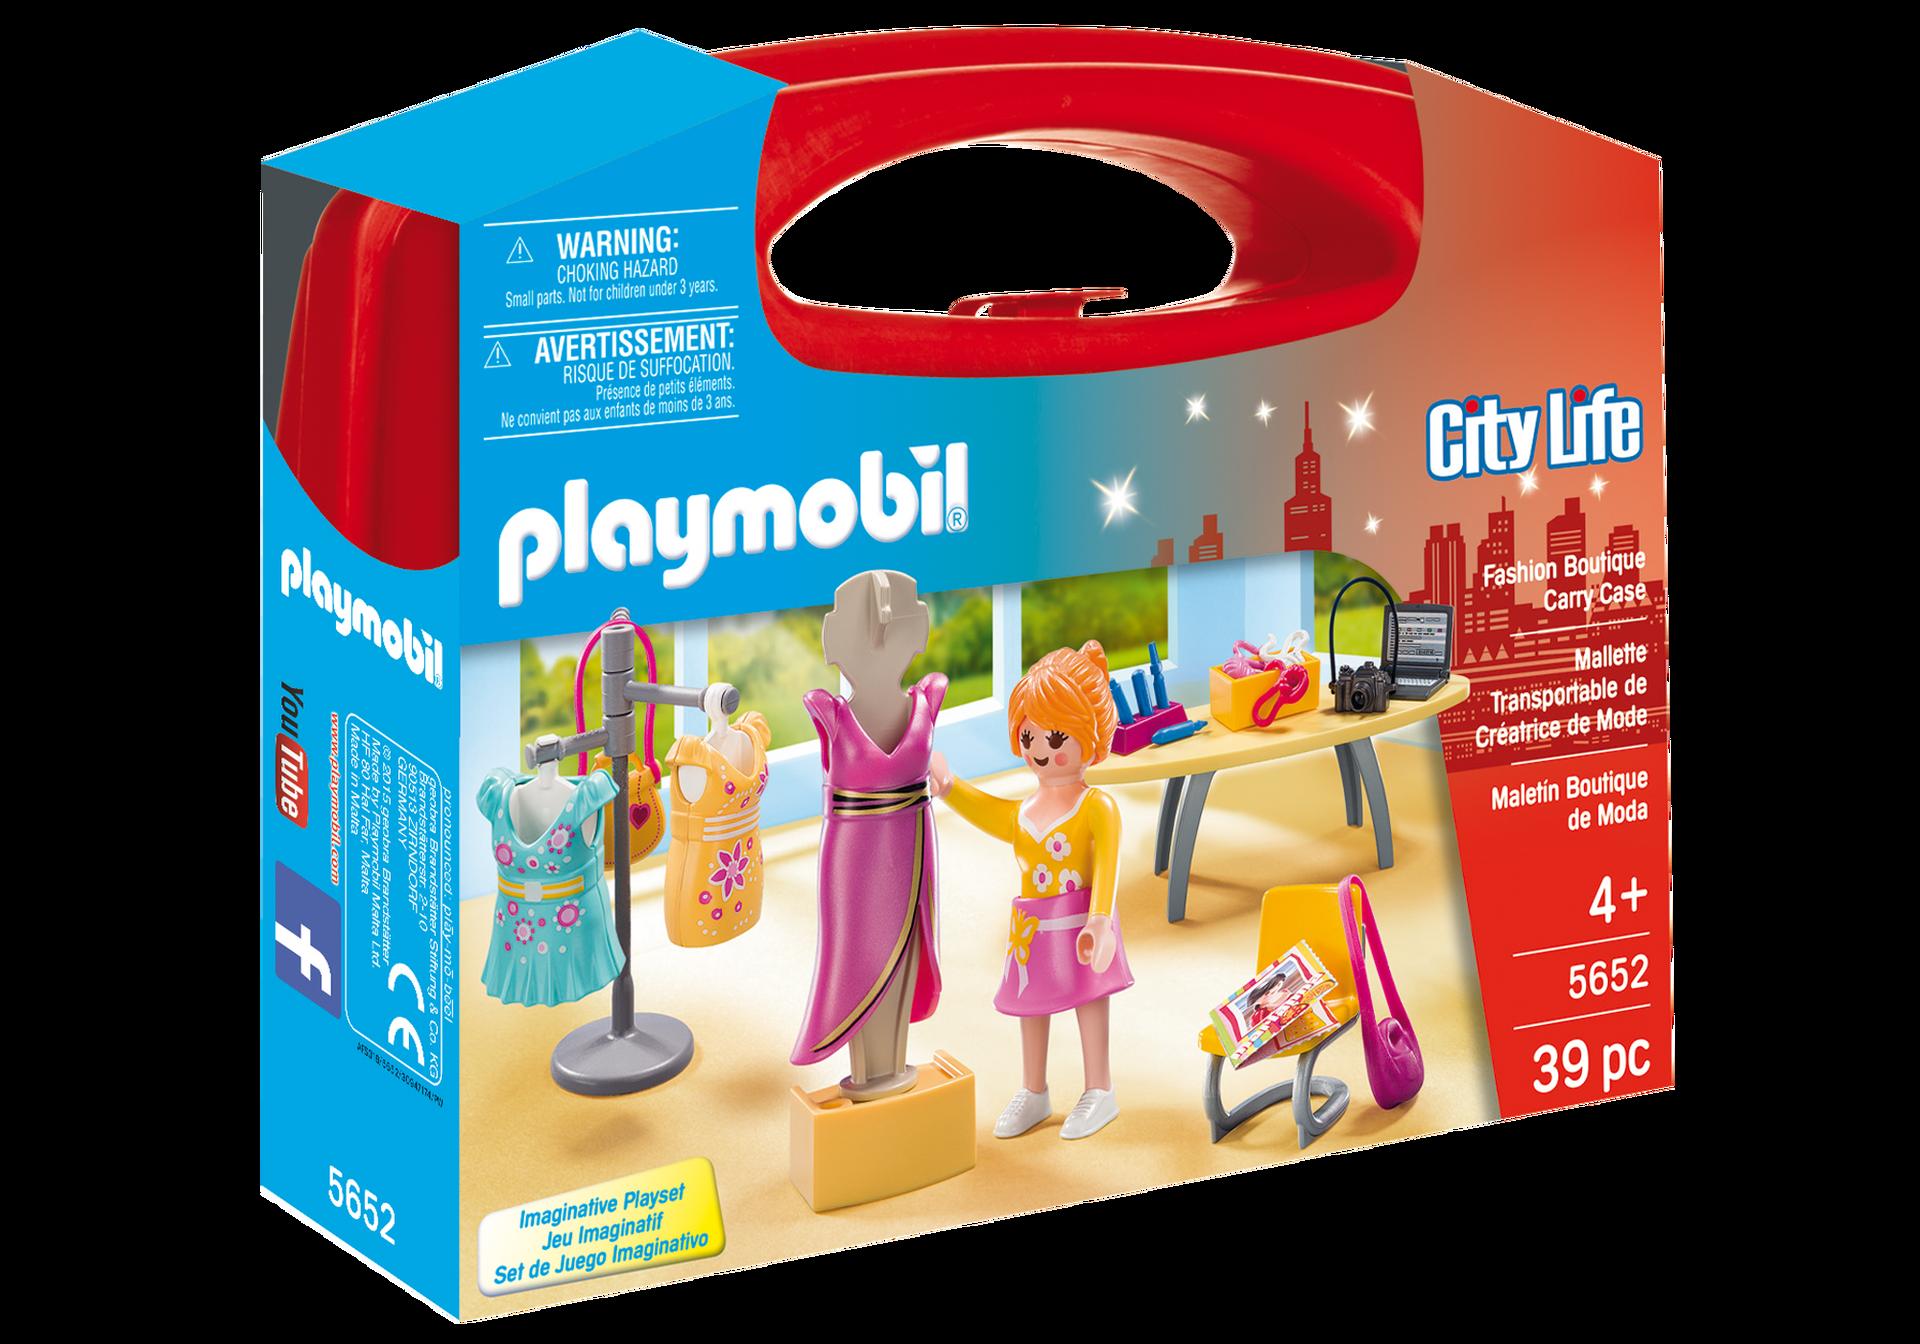 http   media.playmobil.com i playmobil 5652 product box front 4893307b0d6